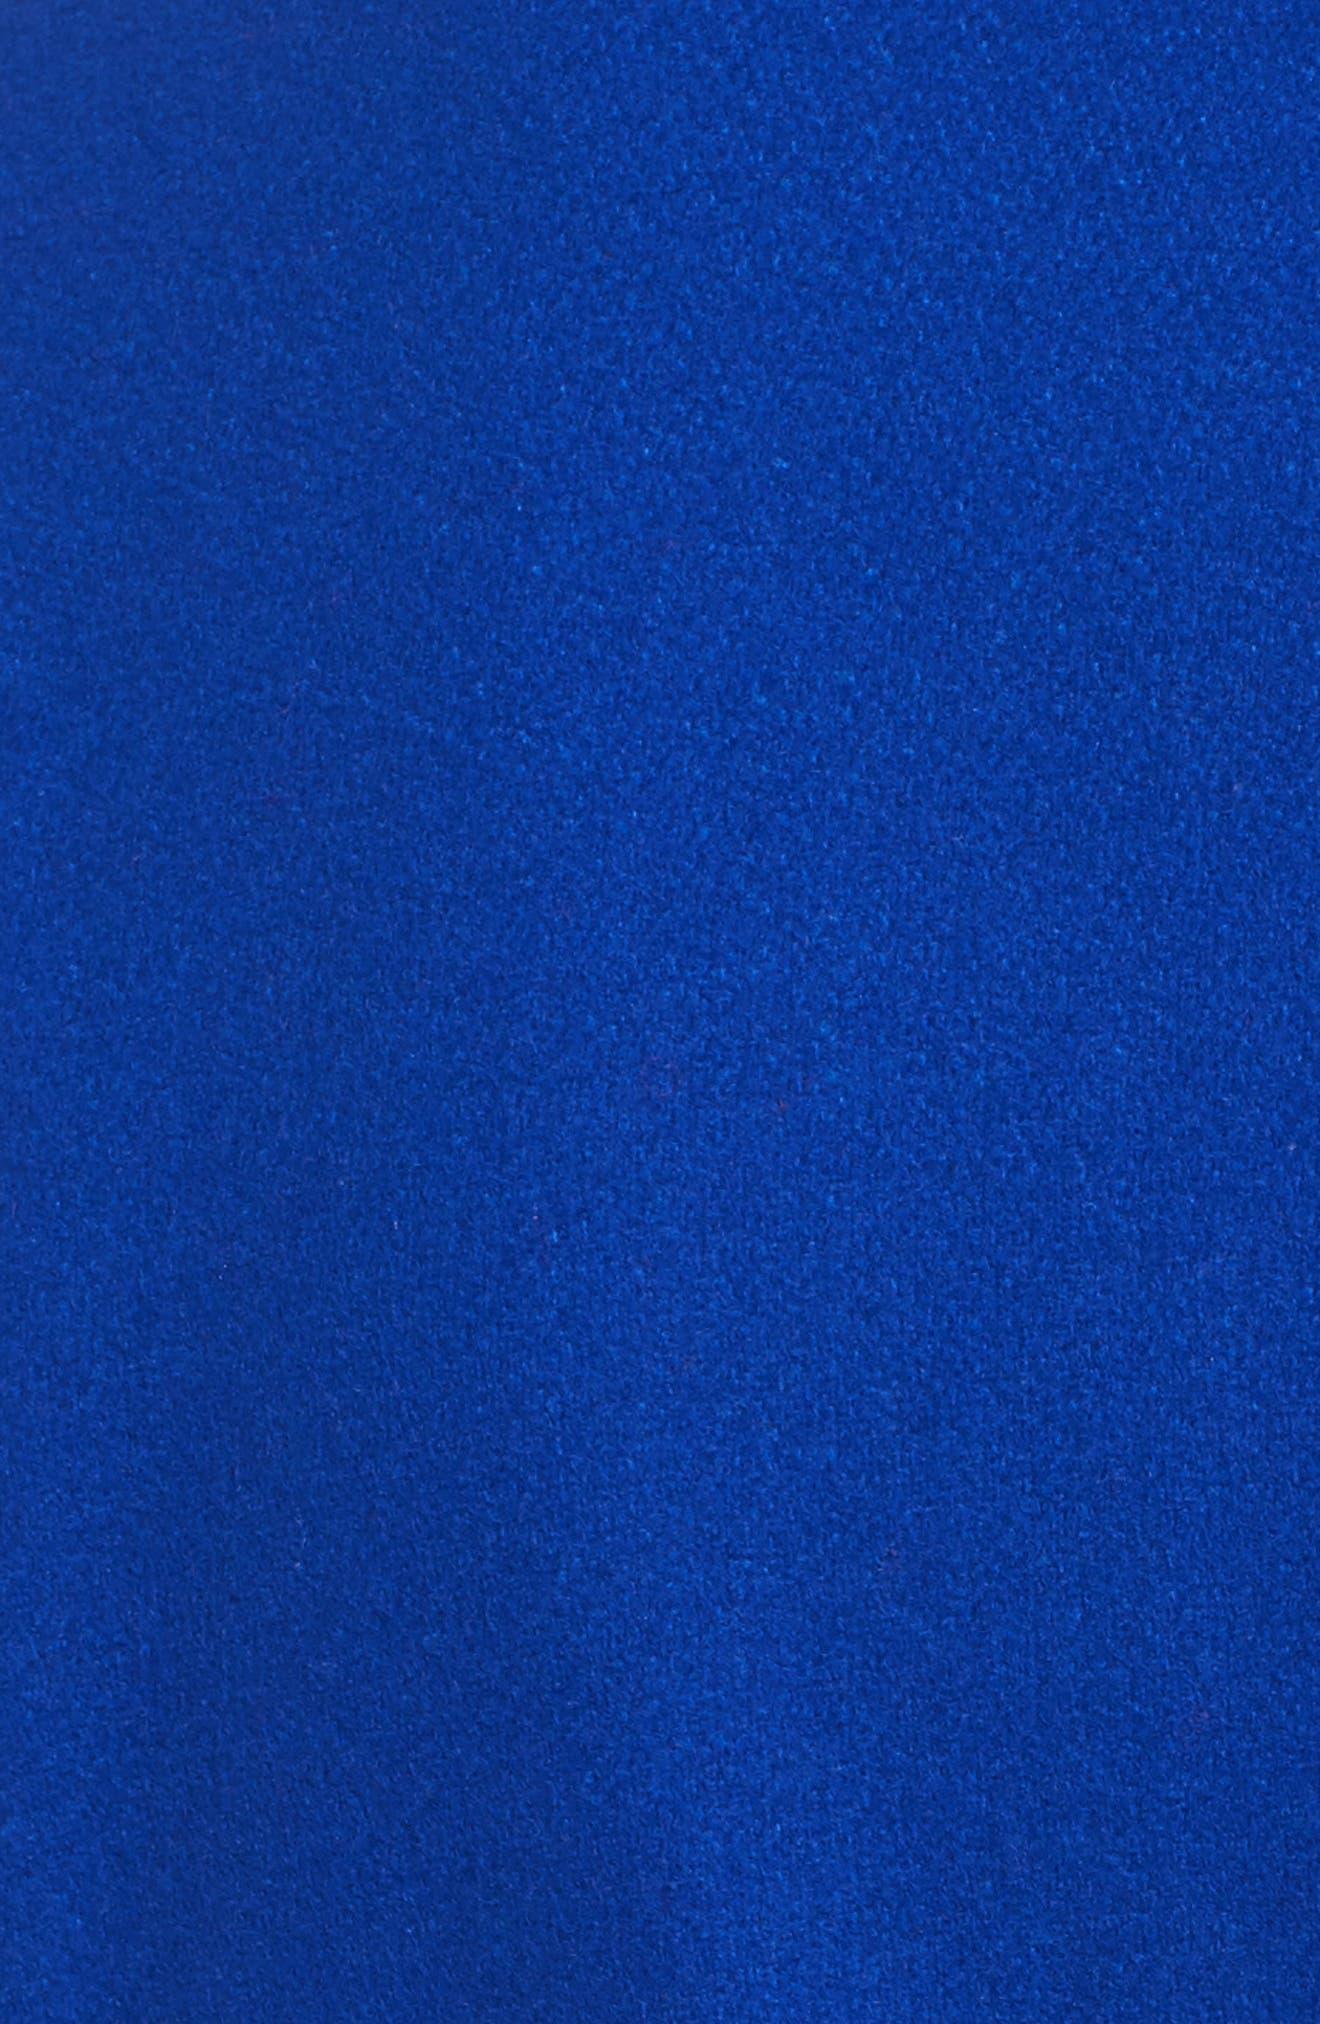 Wool Blend Short Wrap Coat,                             Alternate thumbnail 5, color,                             Bright Blue